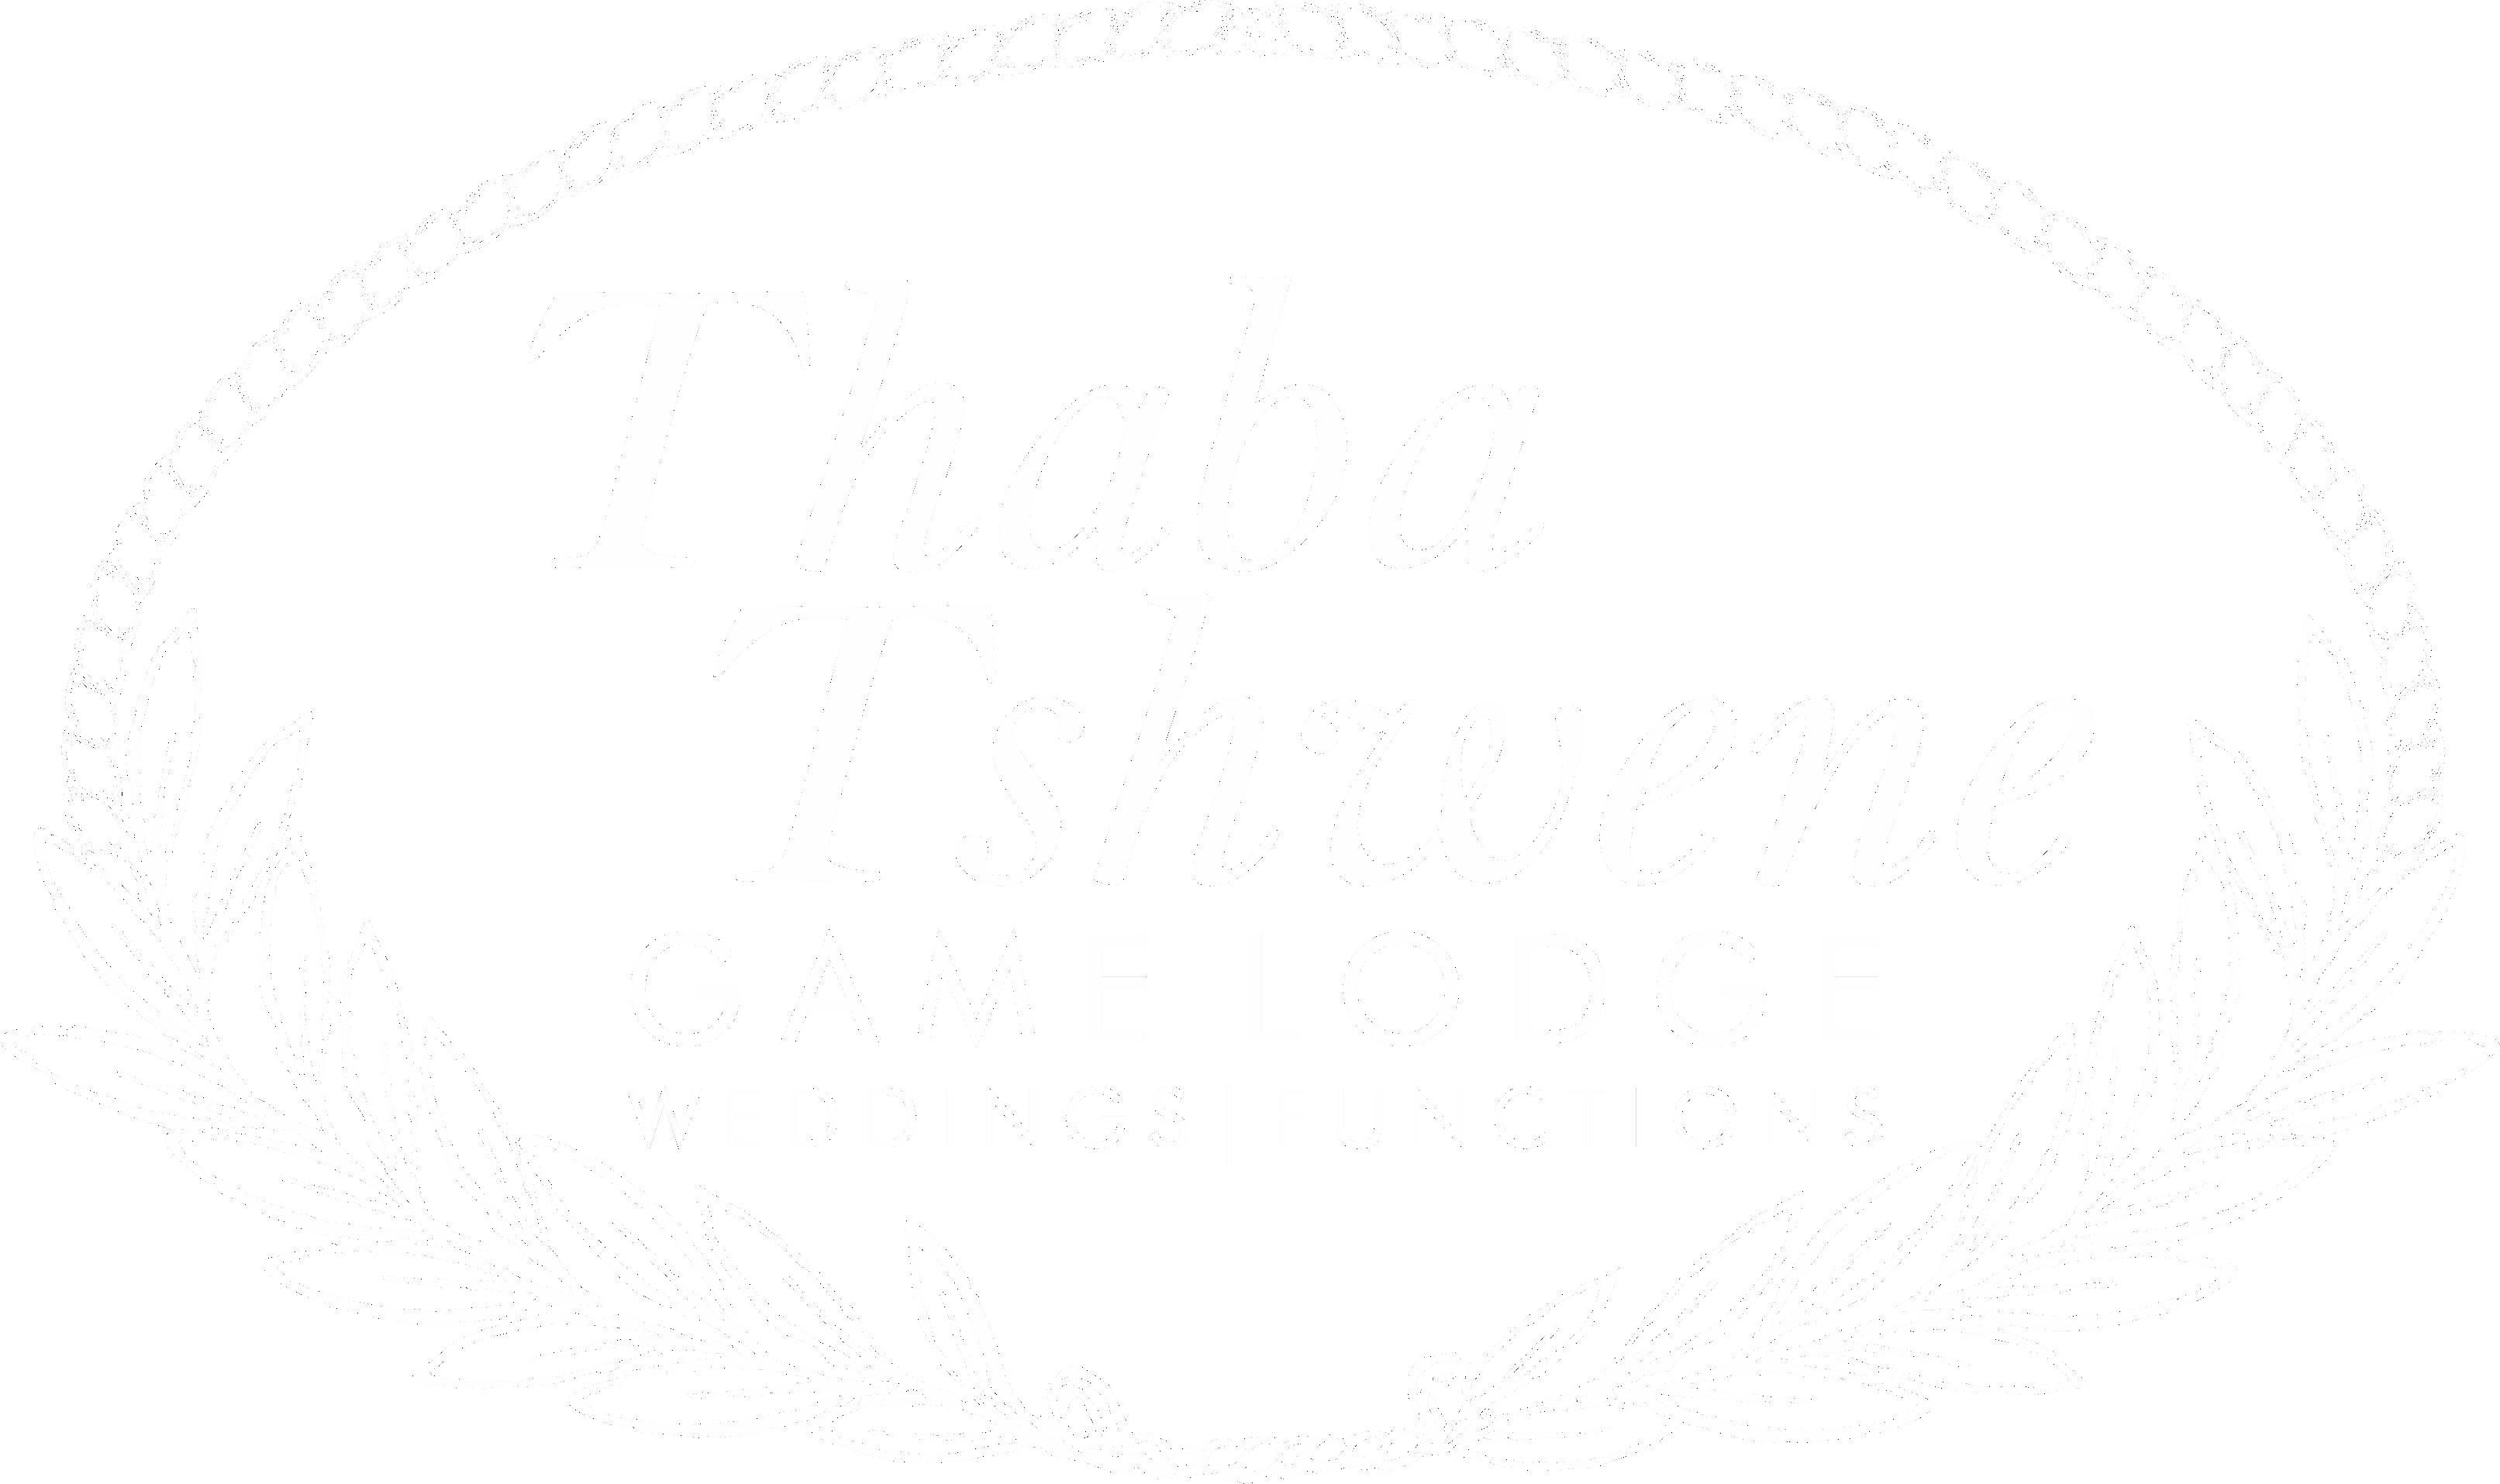 Thaba Tshwene